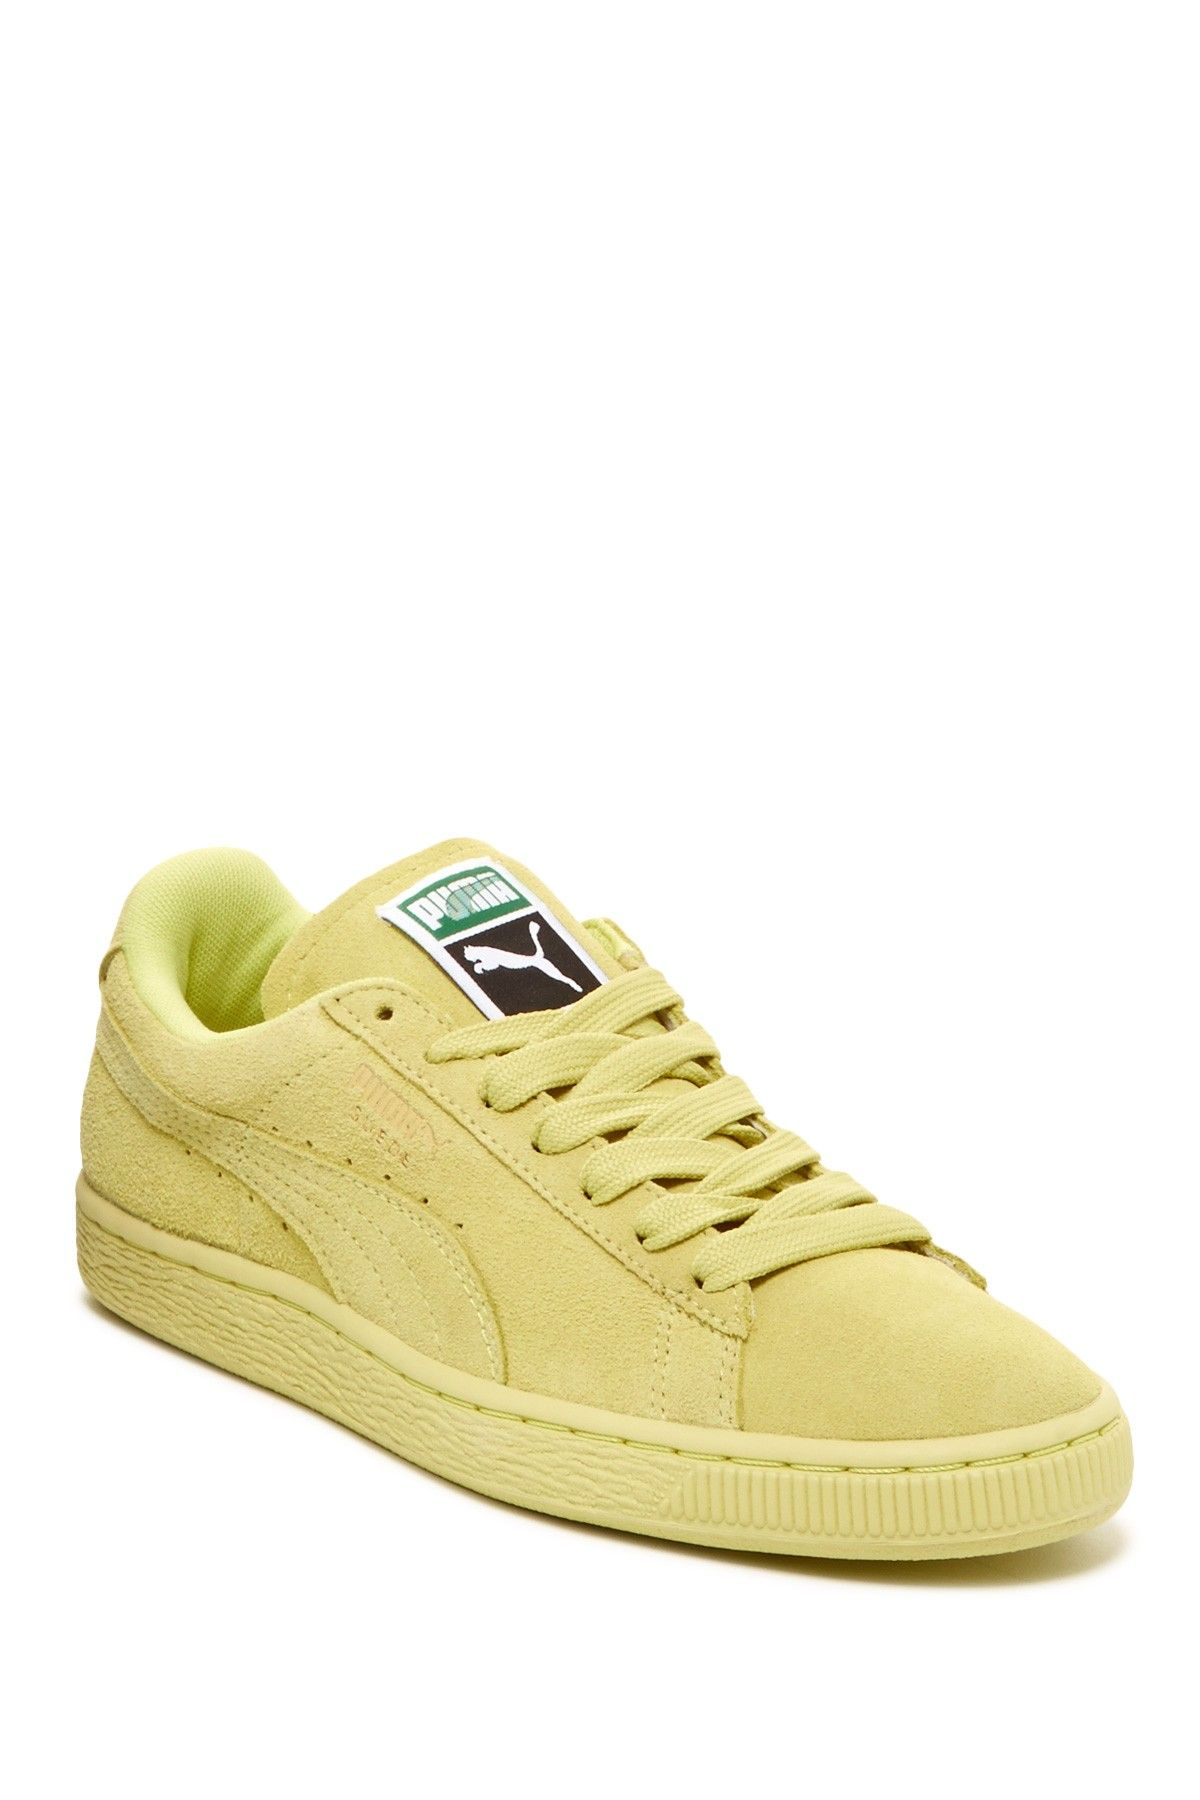 PUMA Suede Classic Sneaker | Sneaker Head | Fashion shoes